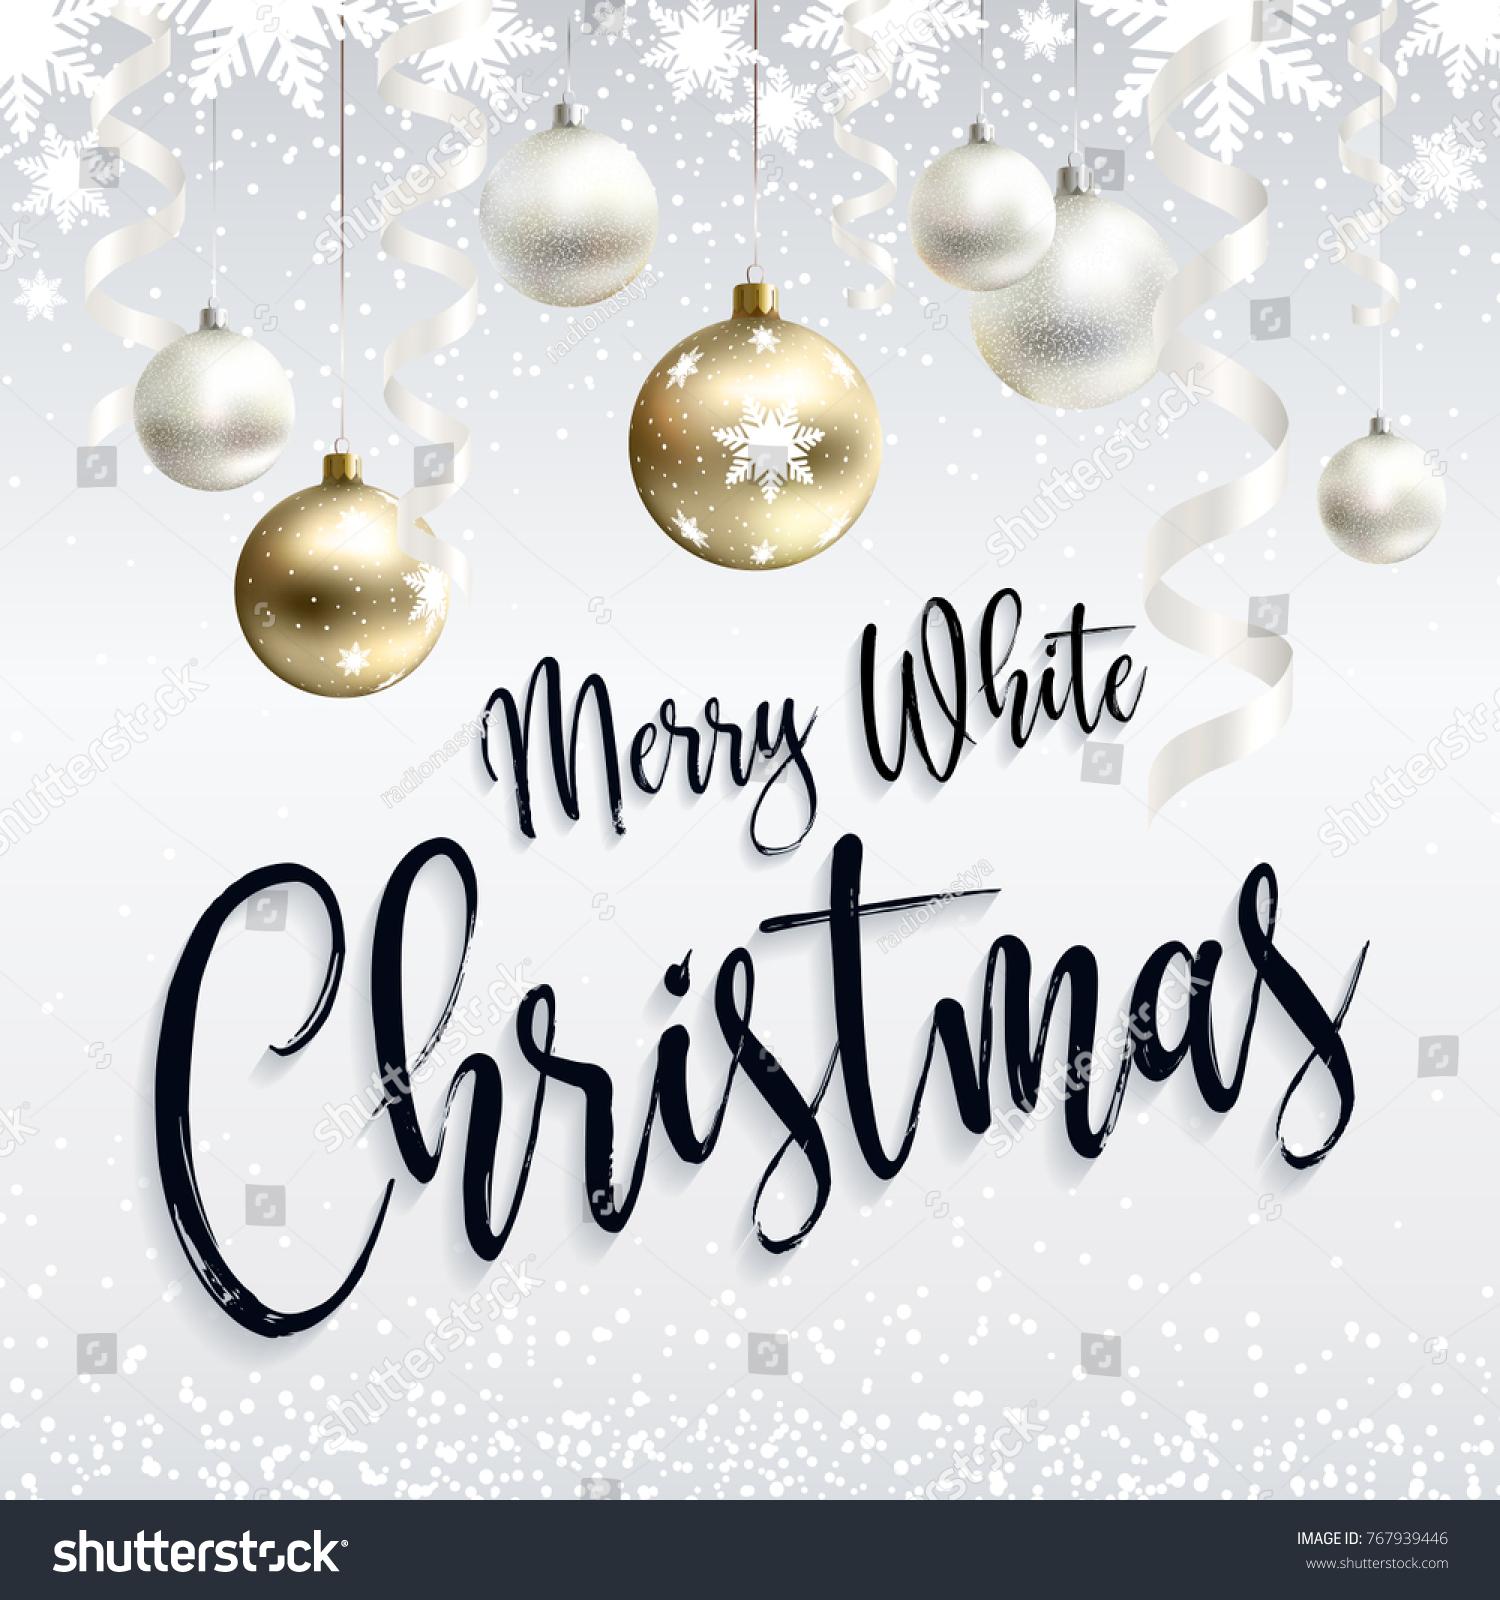 Festive Postcard Merry White Christmas Greetings Stock Vector ...